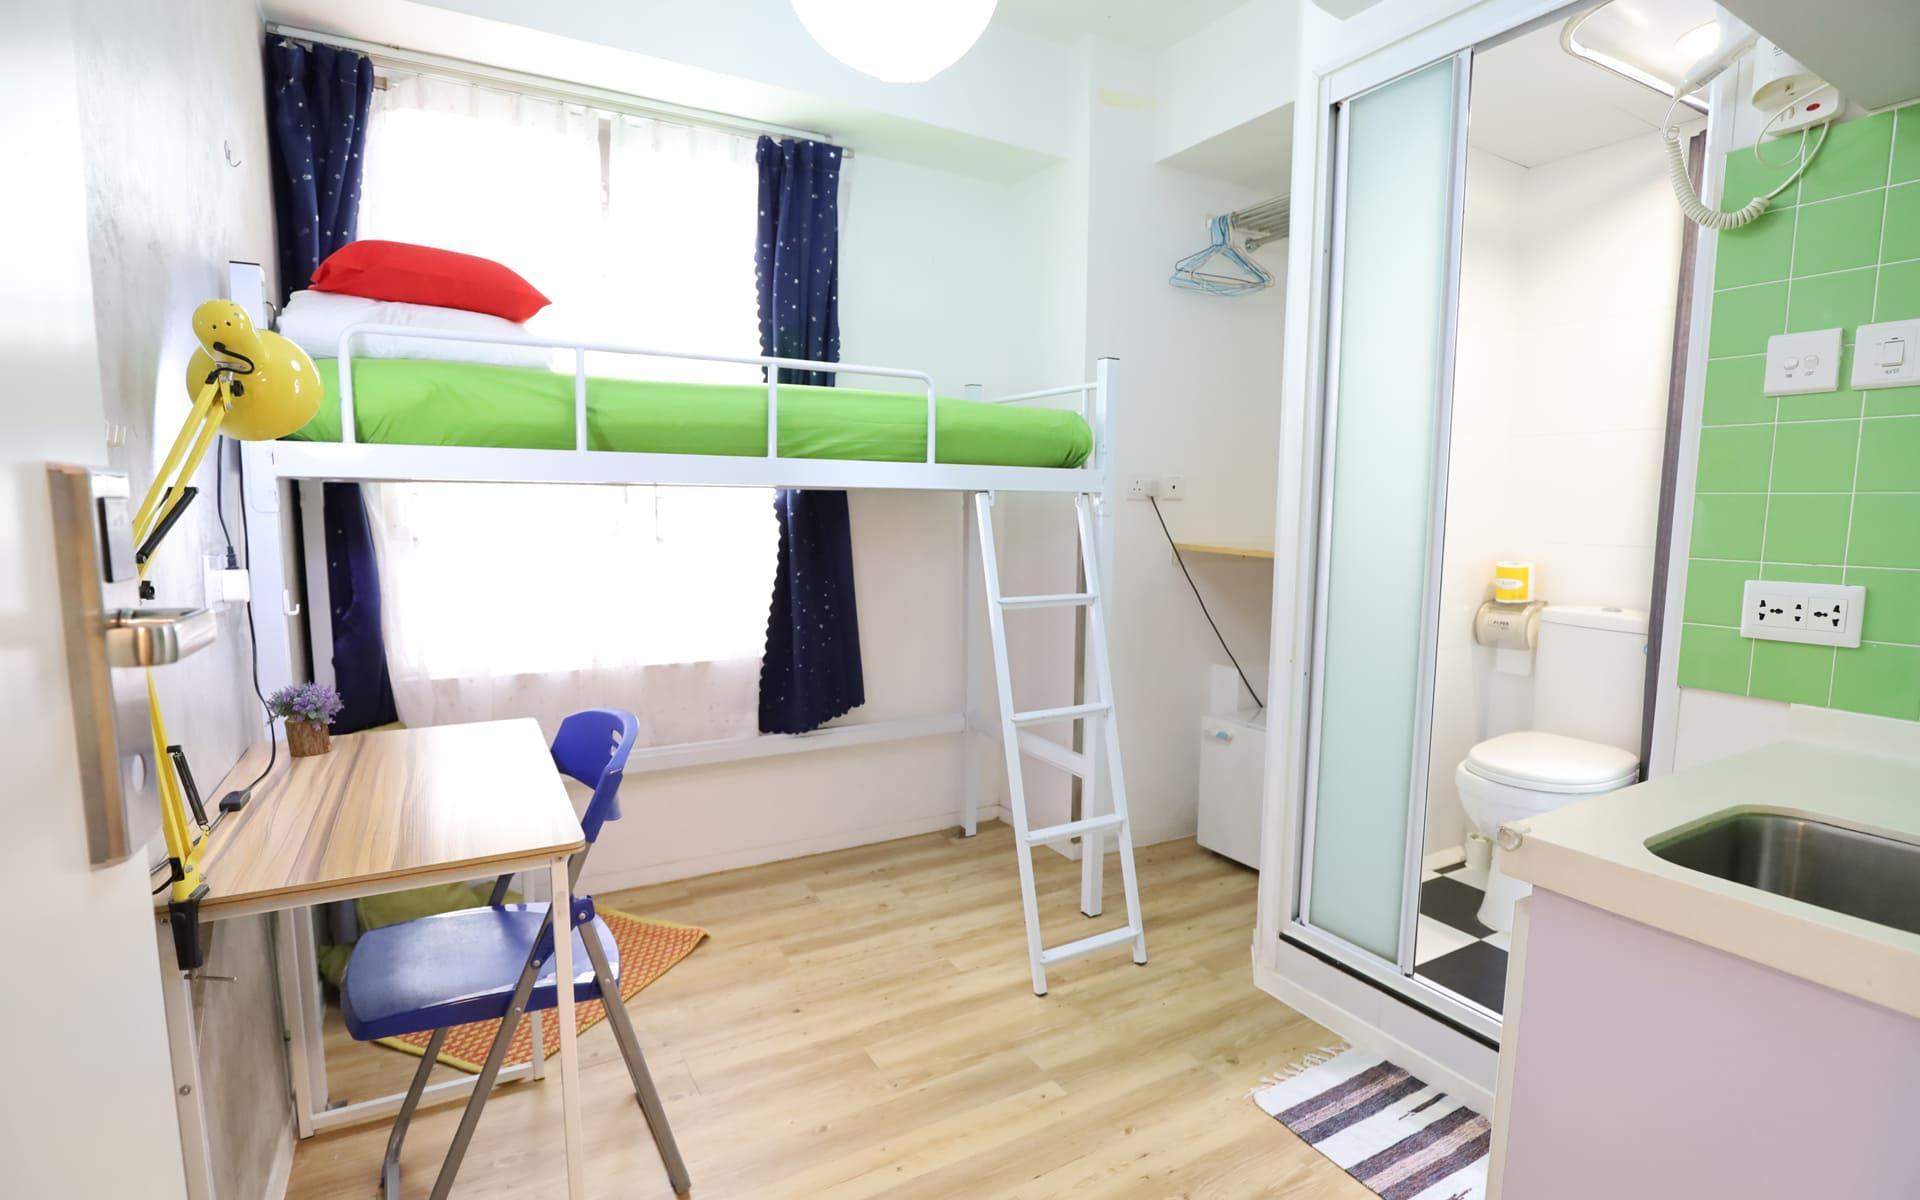 hk_service_apartment_7735951601580801755.jpg